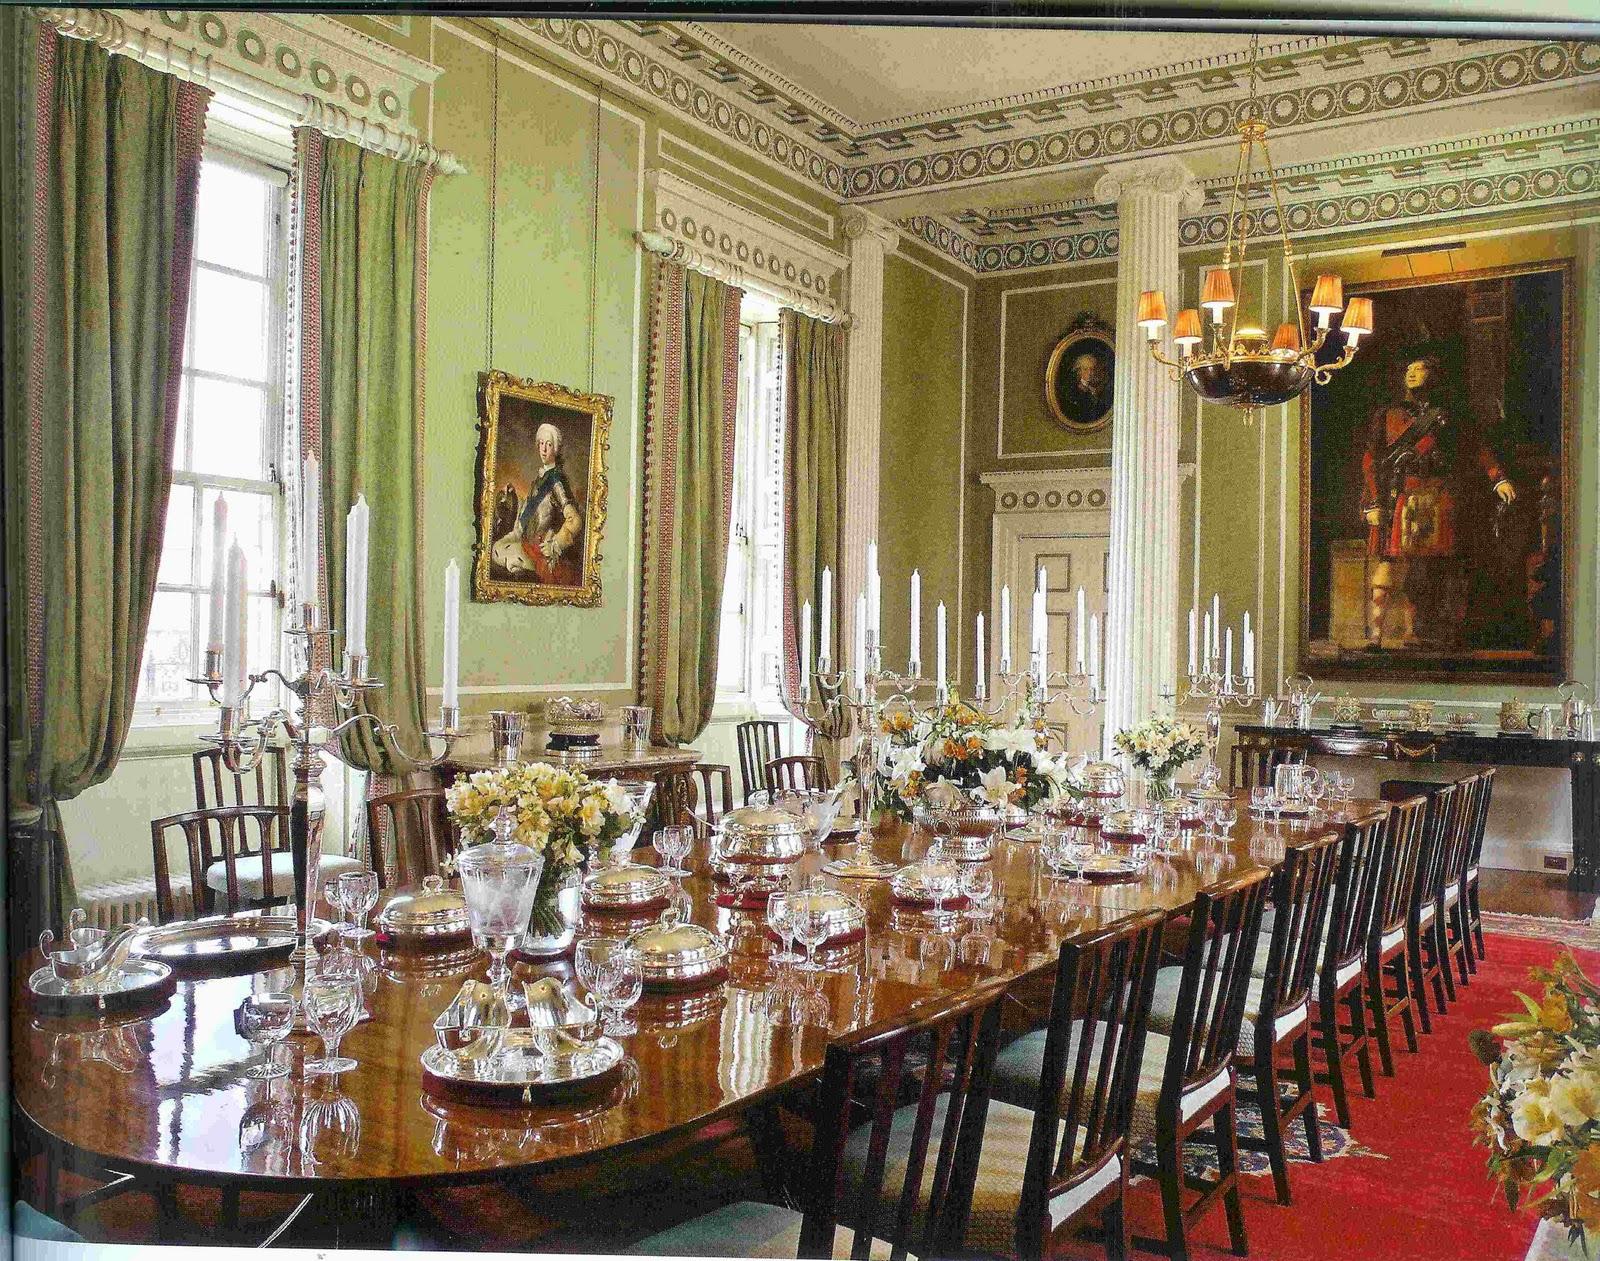 royal dining room im royal dining room auch